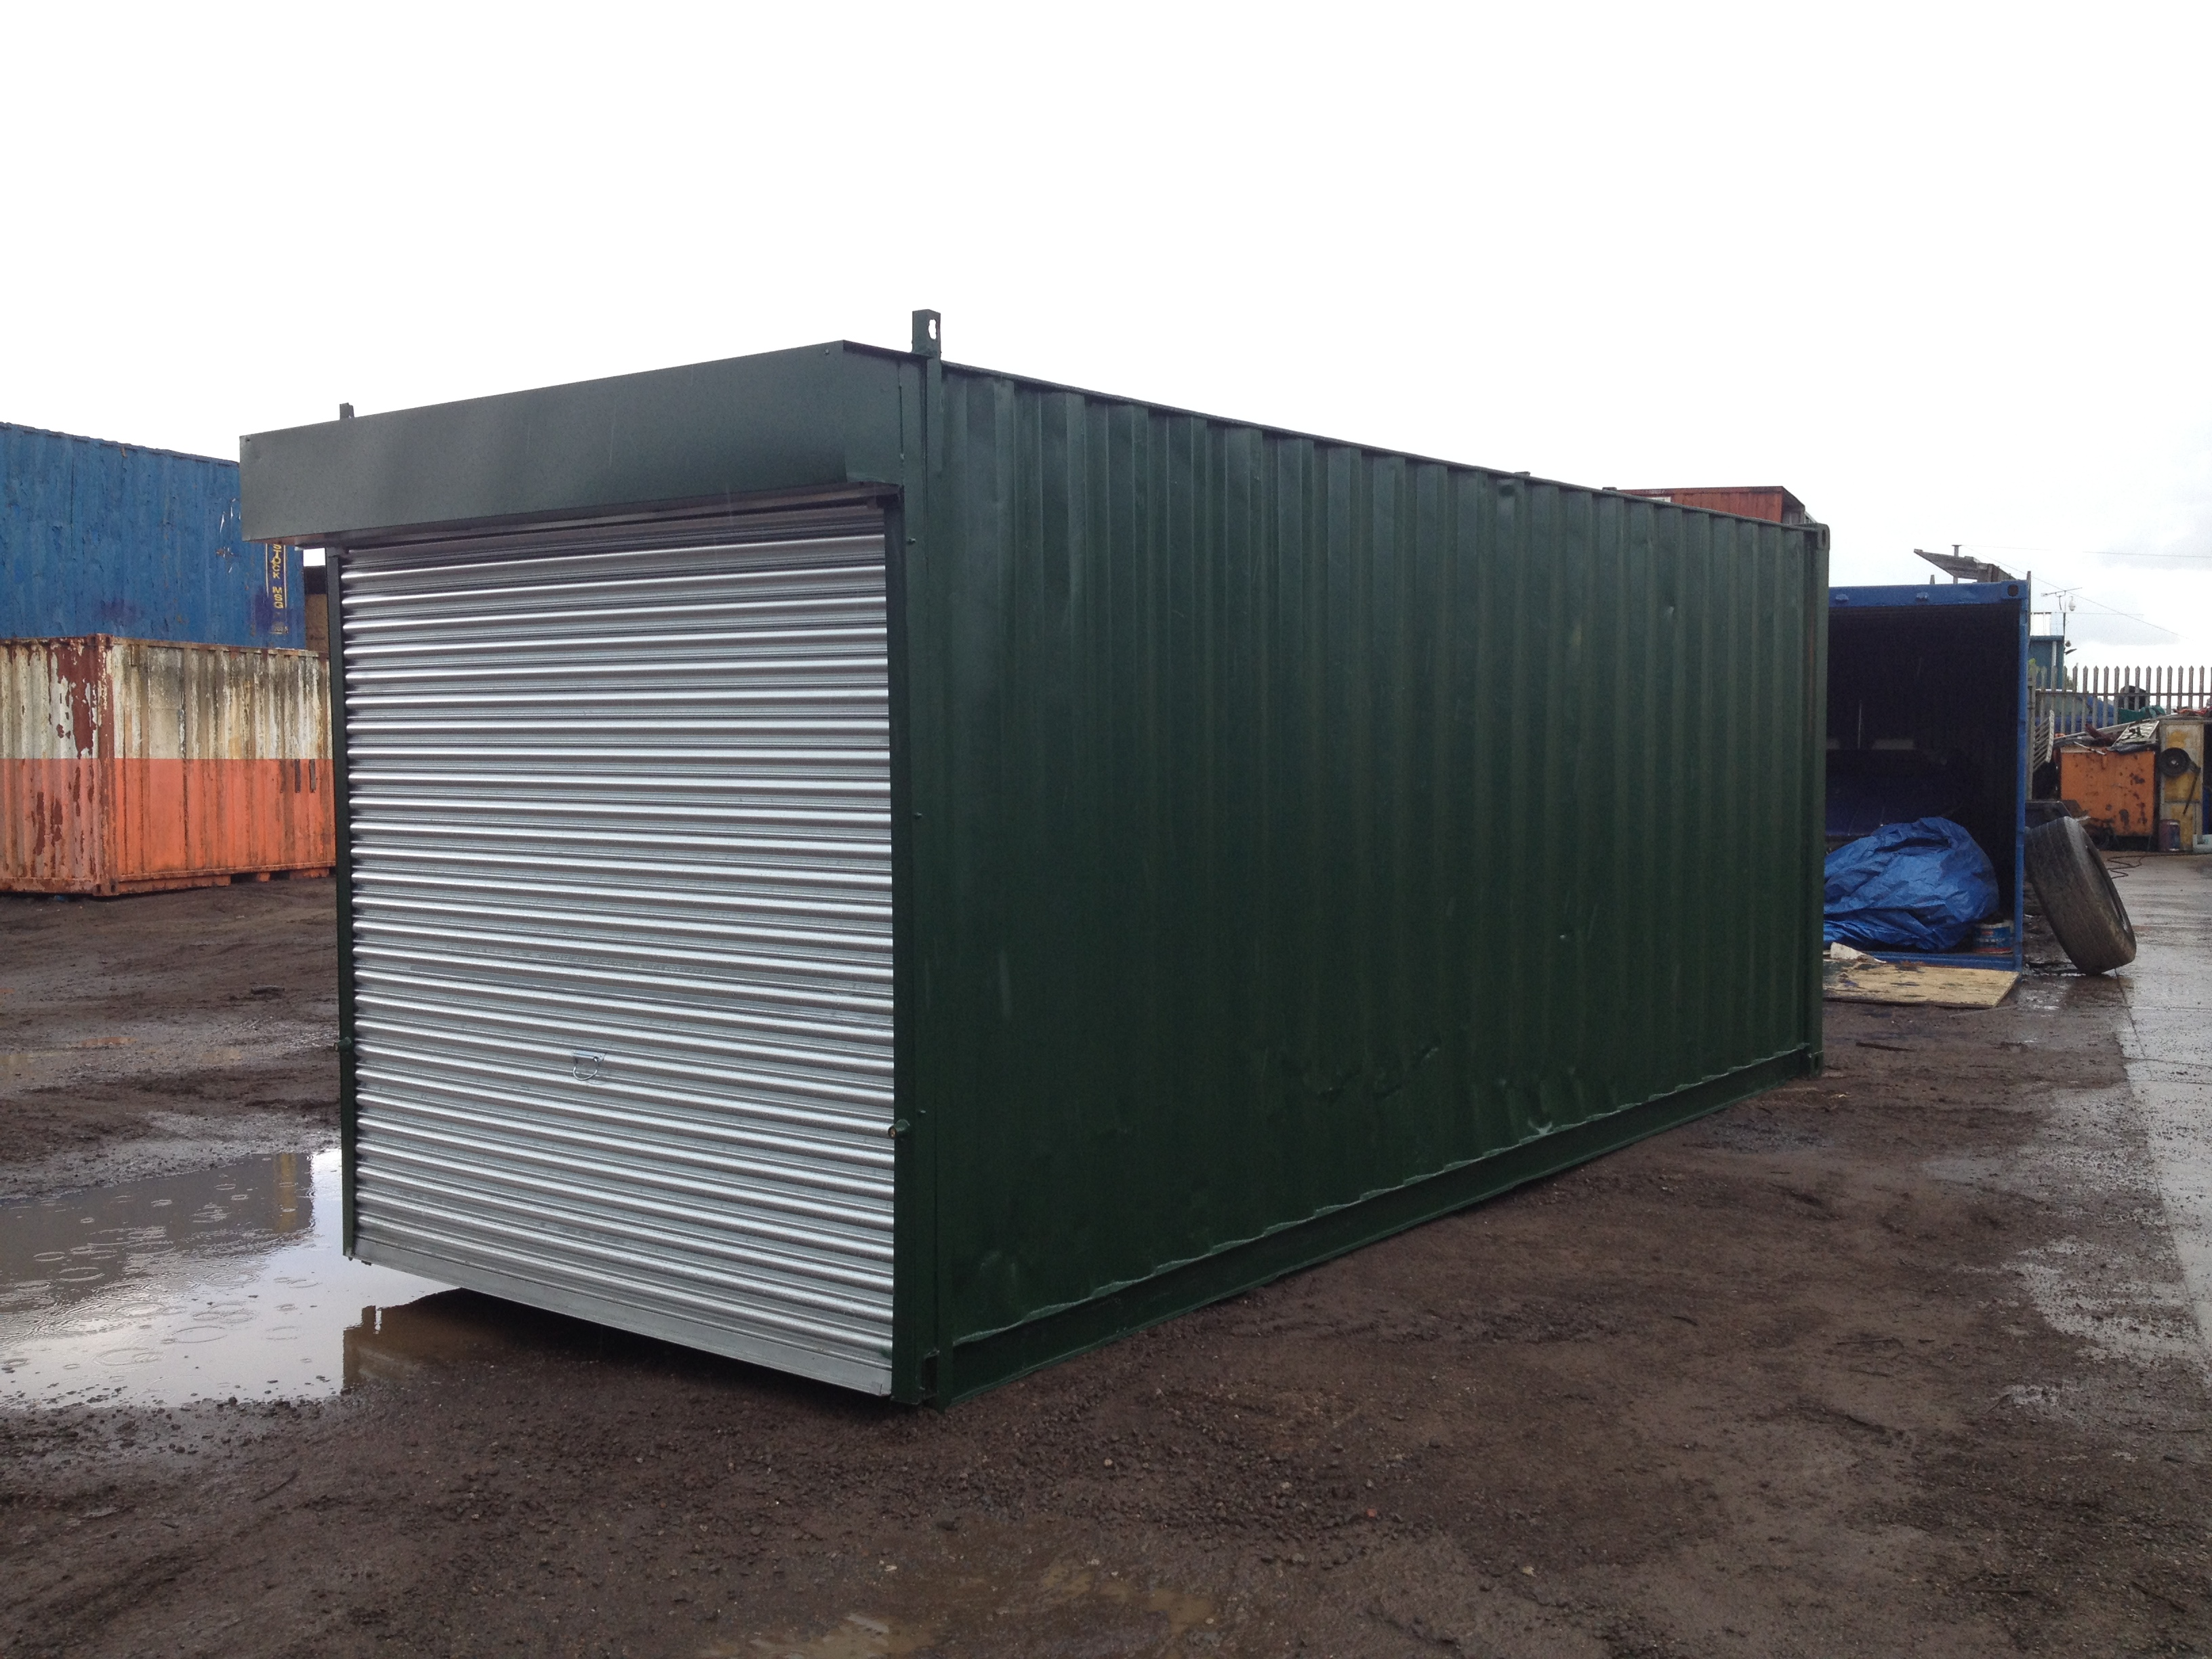 Freight Storage Containers Itsmyfun